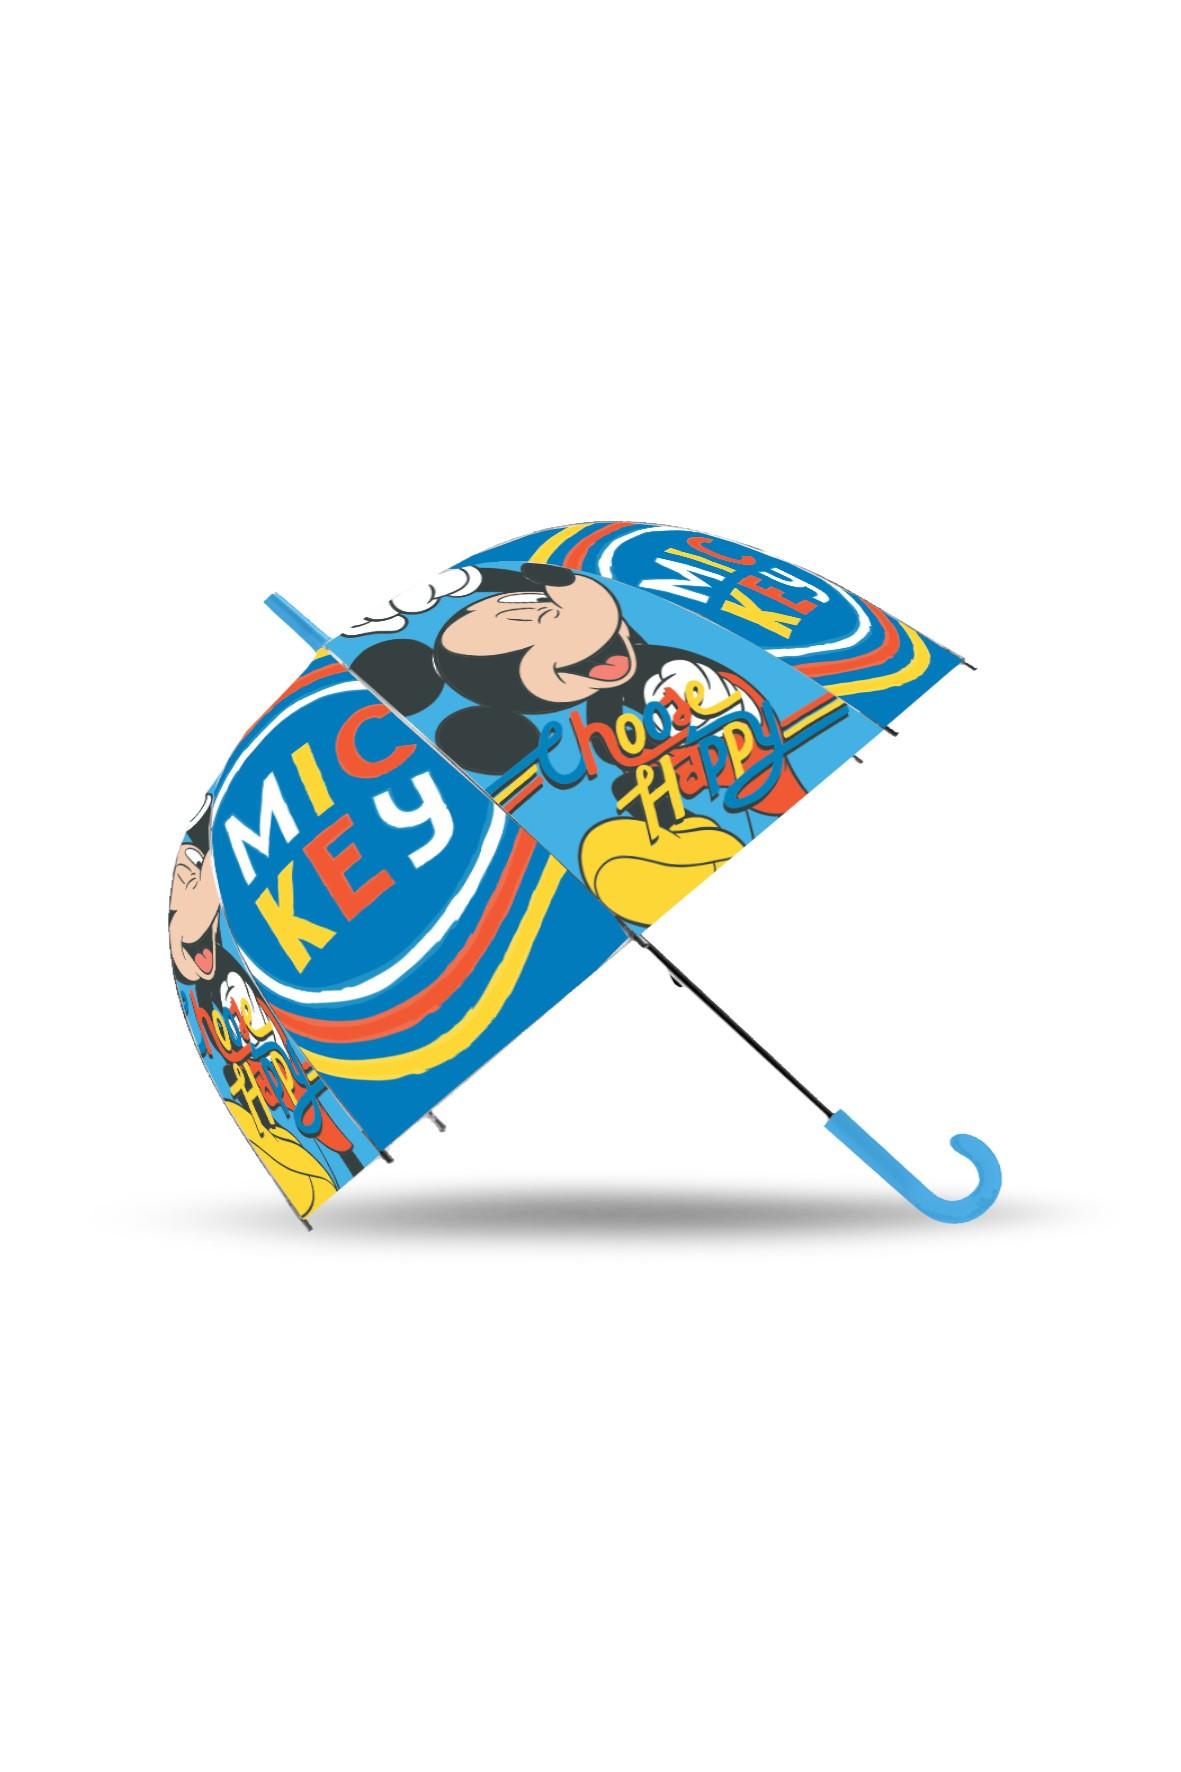 Parasolka dla dziecka Myszka Miki